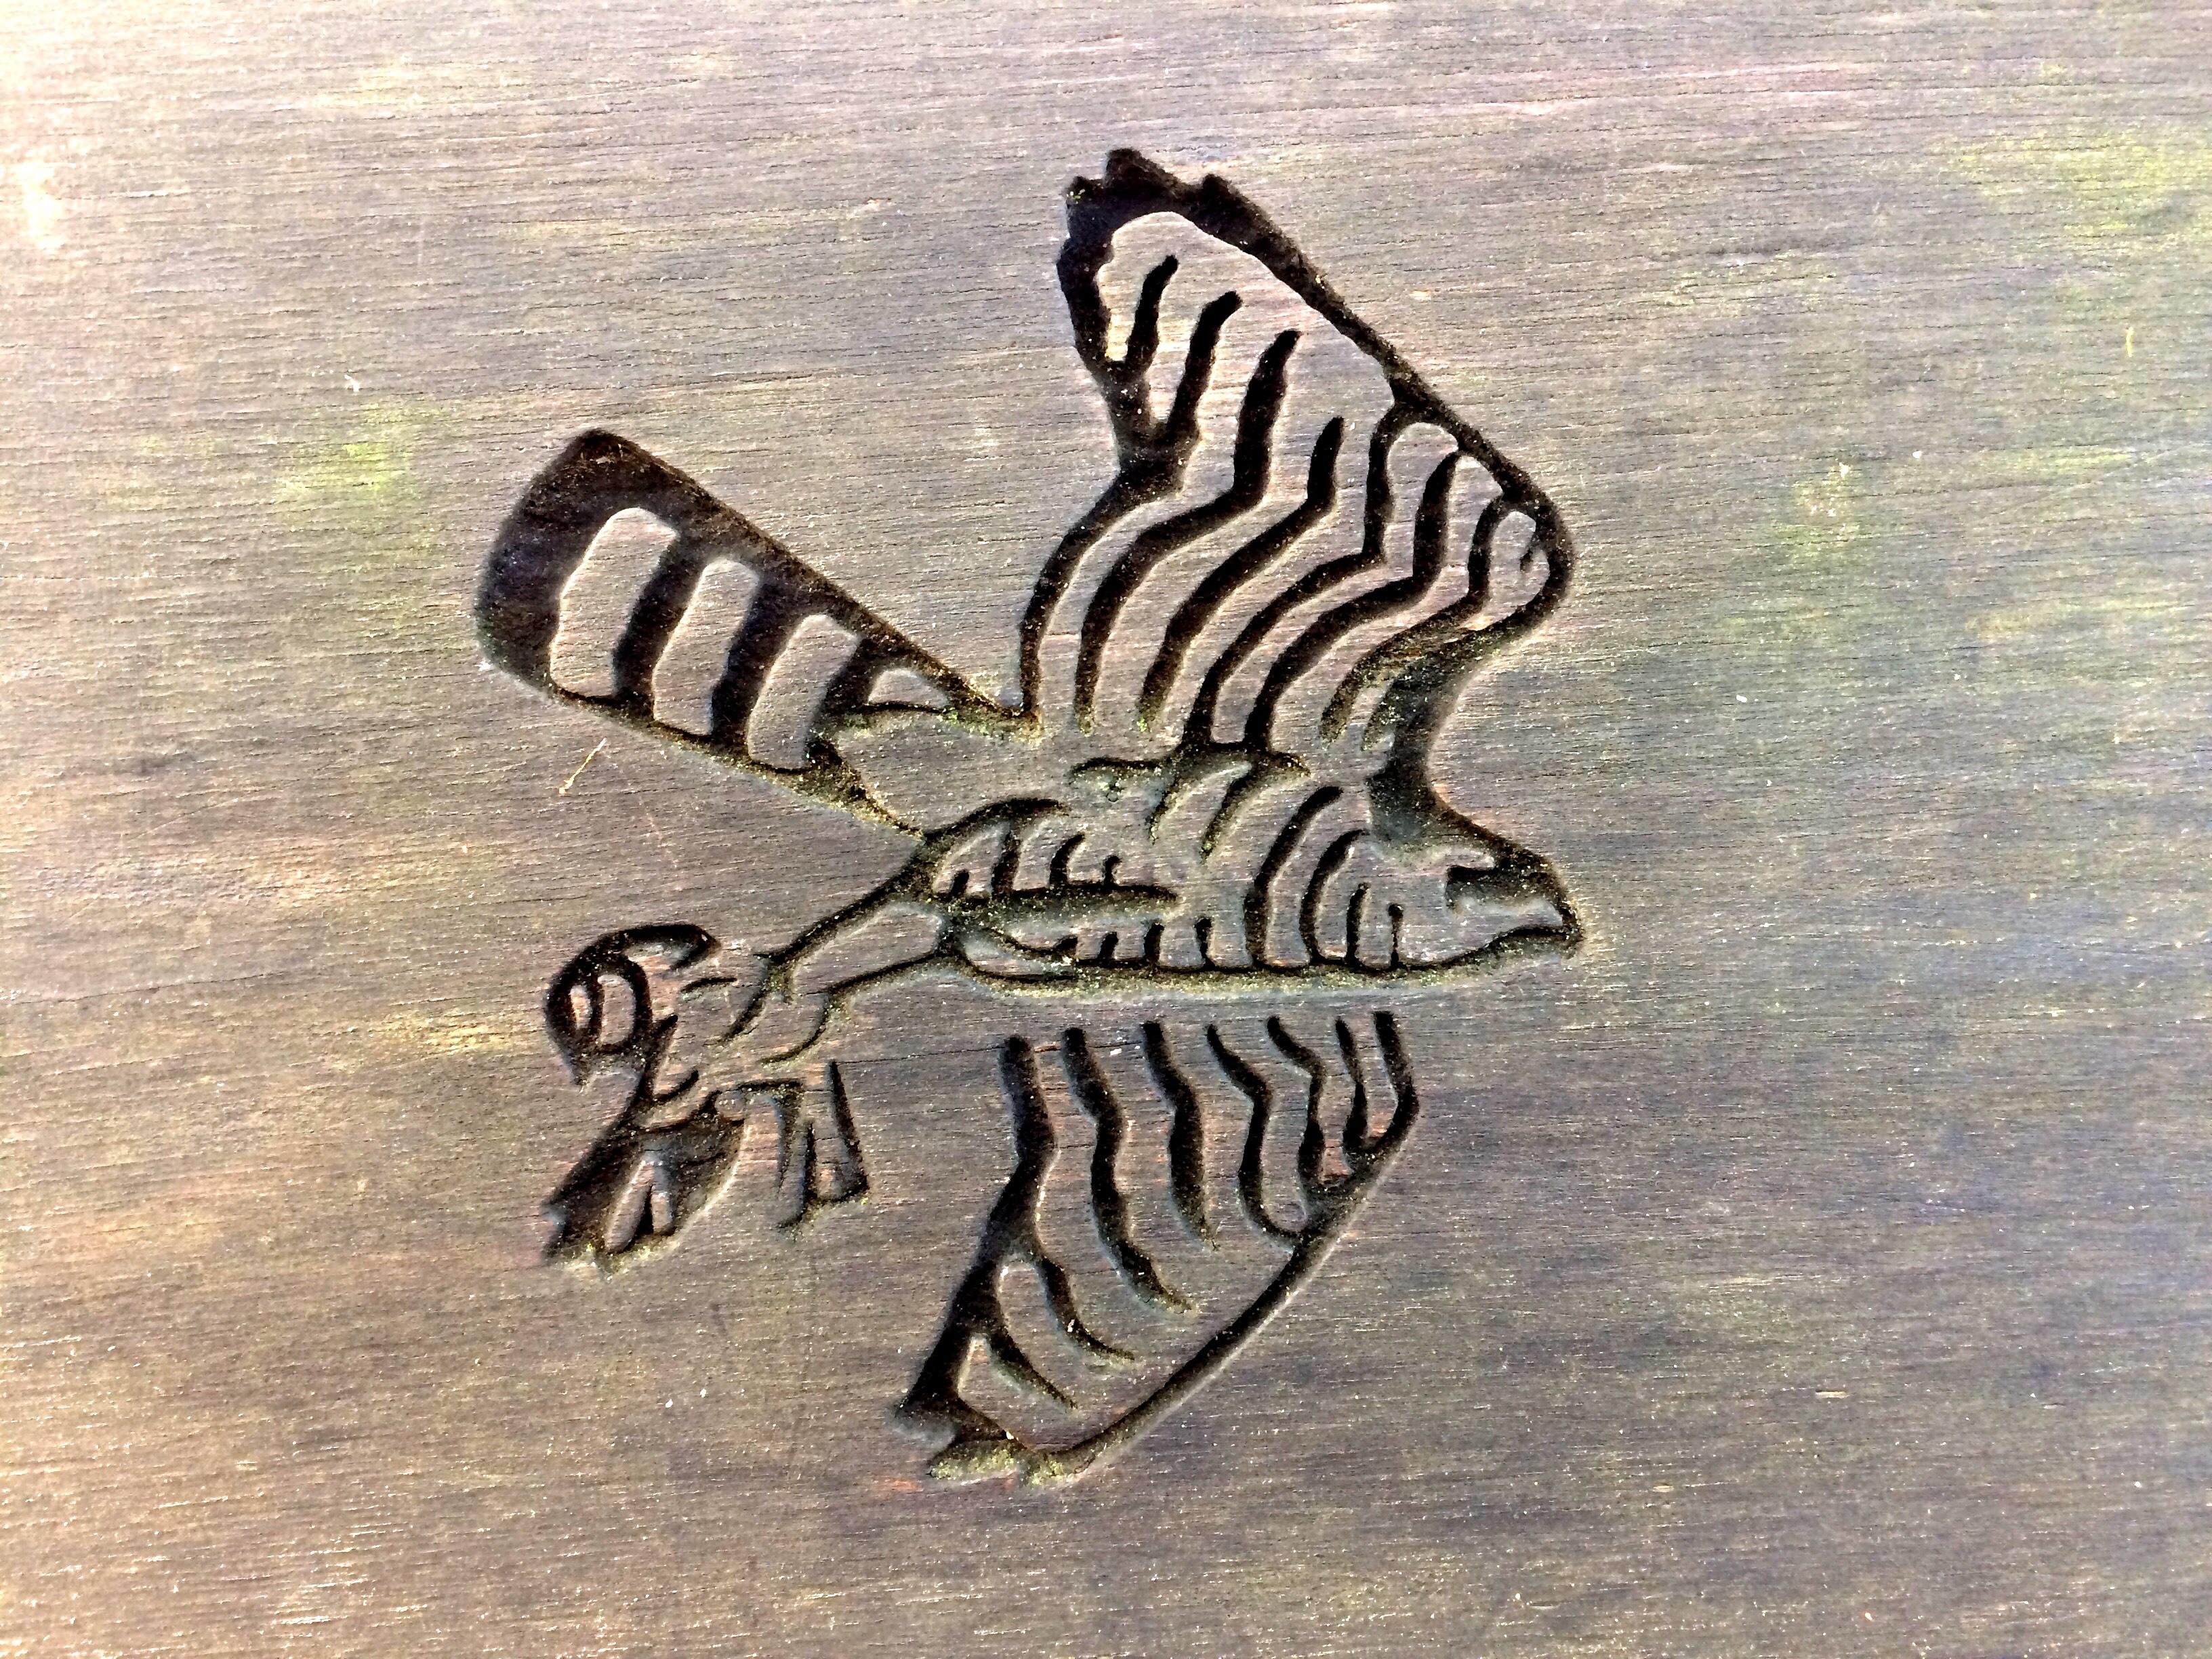 Sparrowhawk - The Hall of Einar - copyright David Bailey (not the)